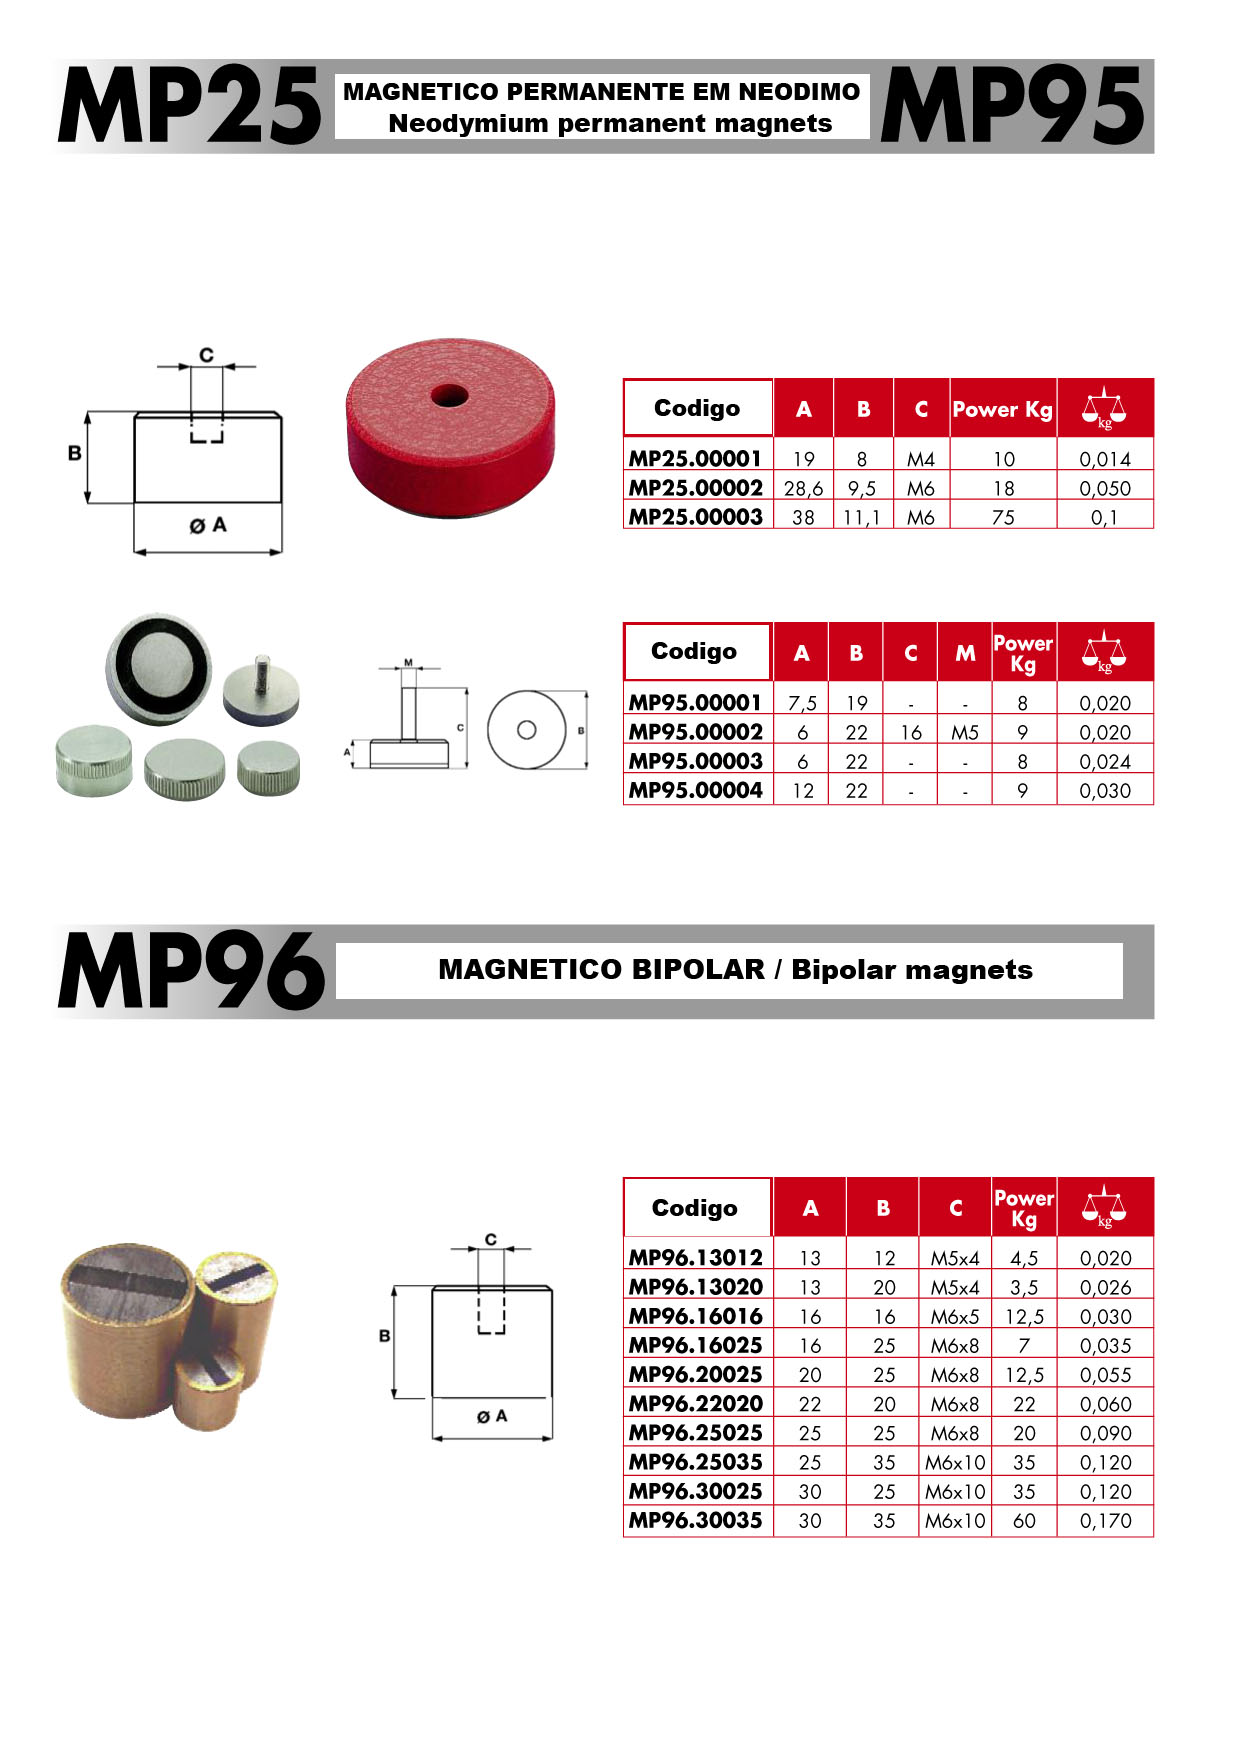 Magnéticos MP25 / MP95 e MP96